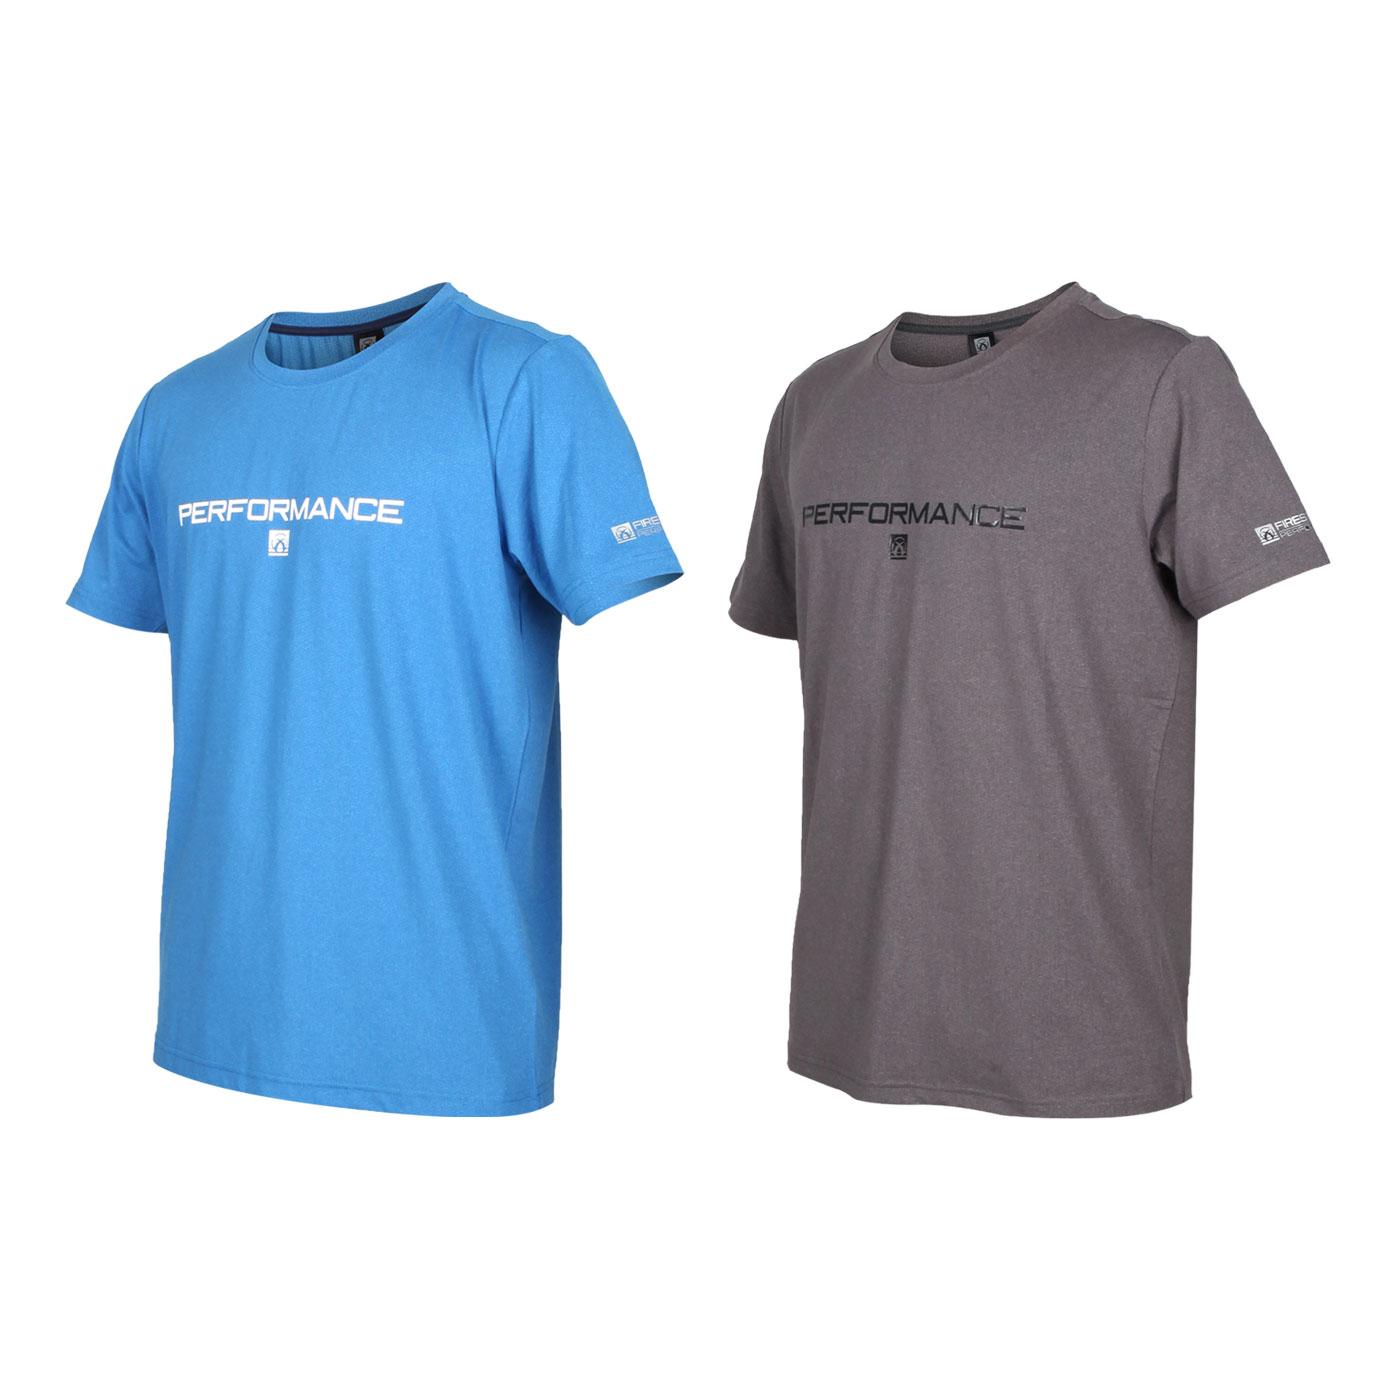 FIRESTAR 男款彈性印花圓領短袖T恤 D0538-18